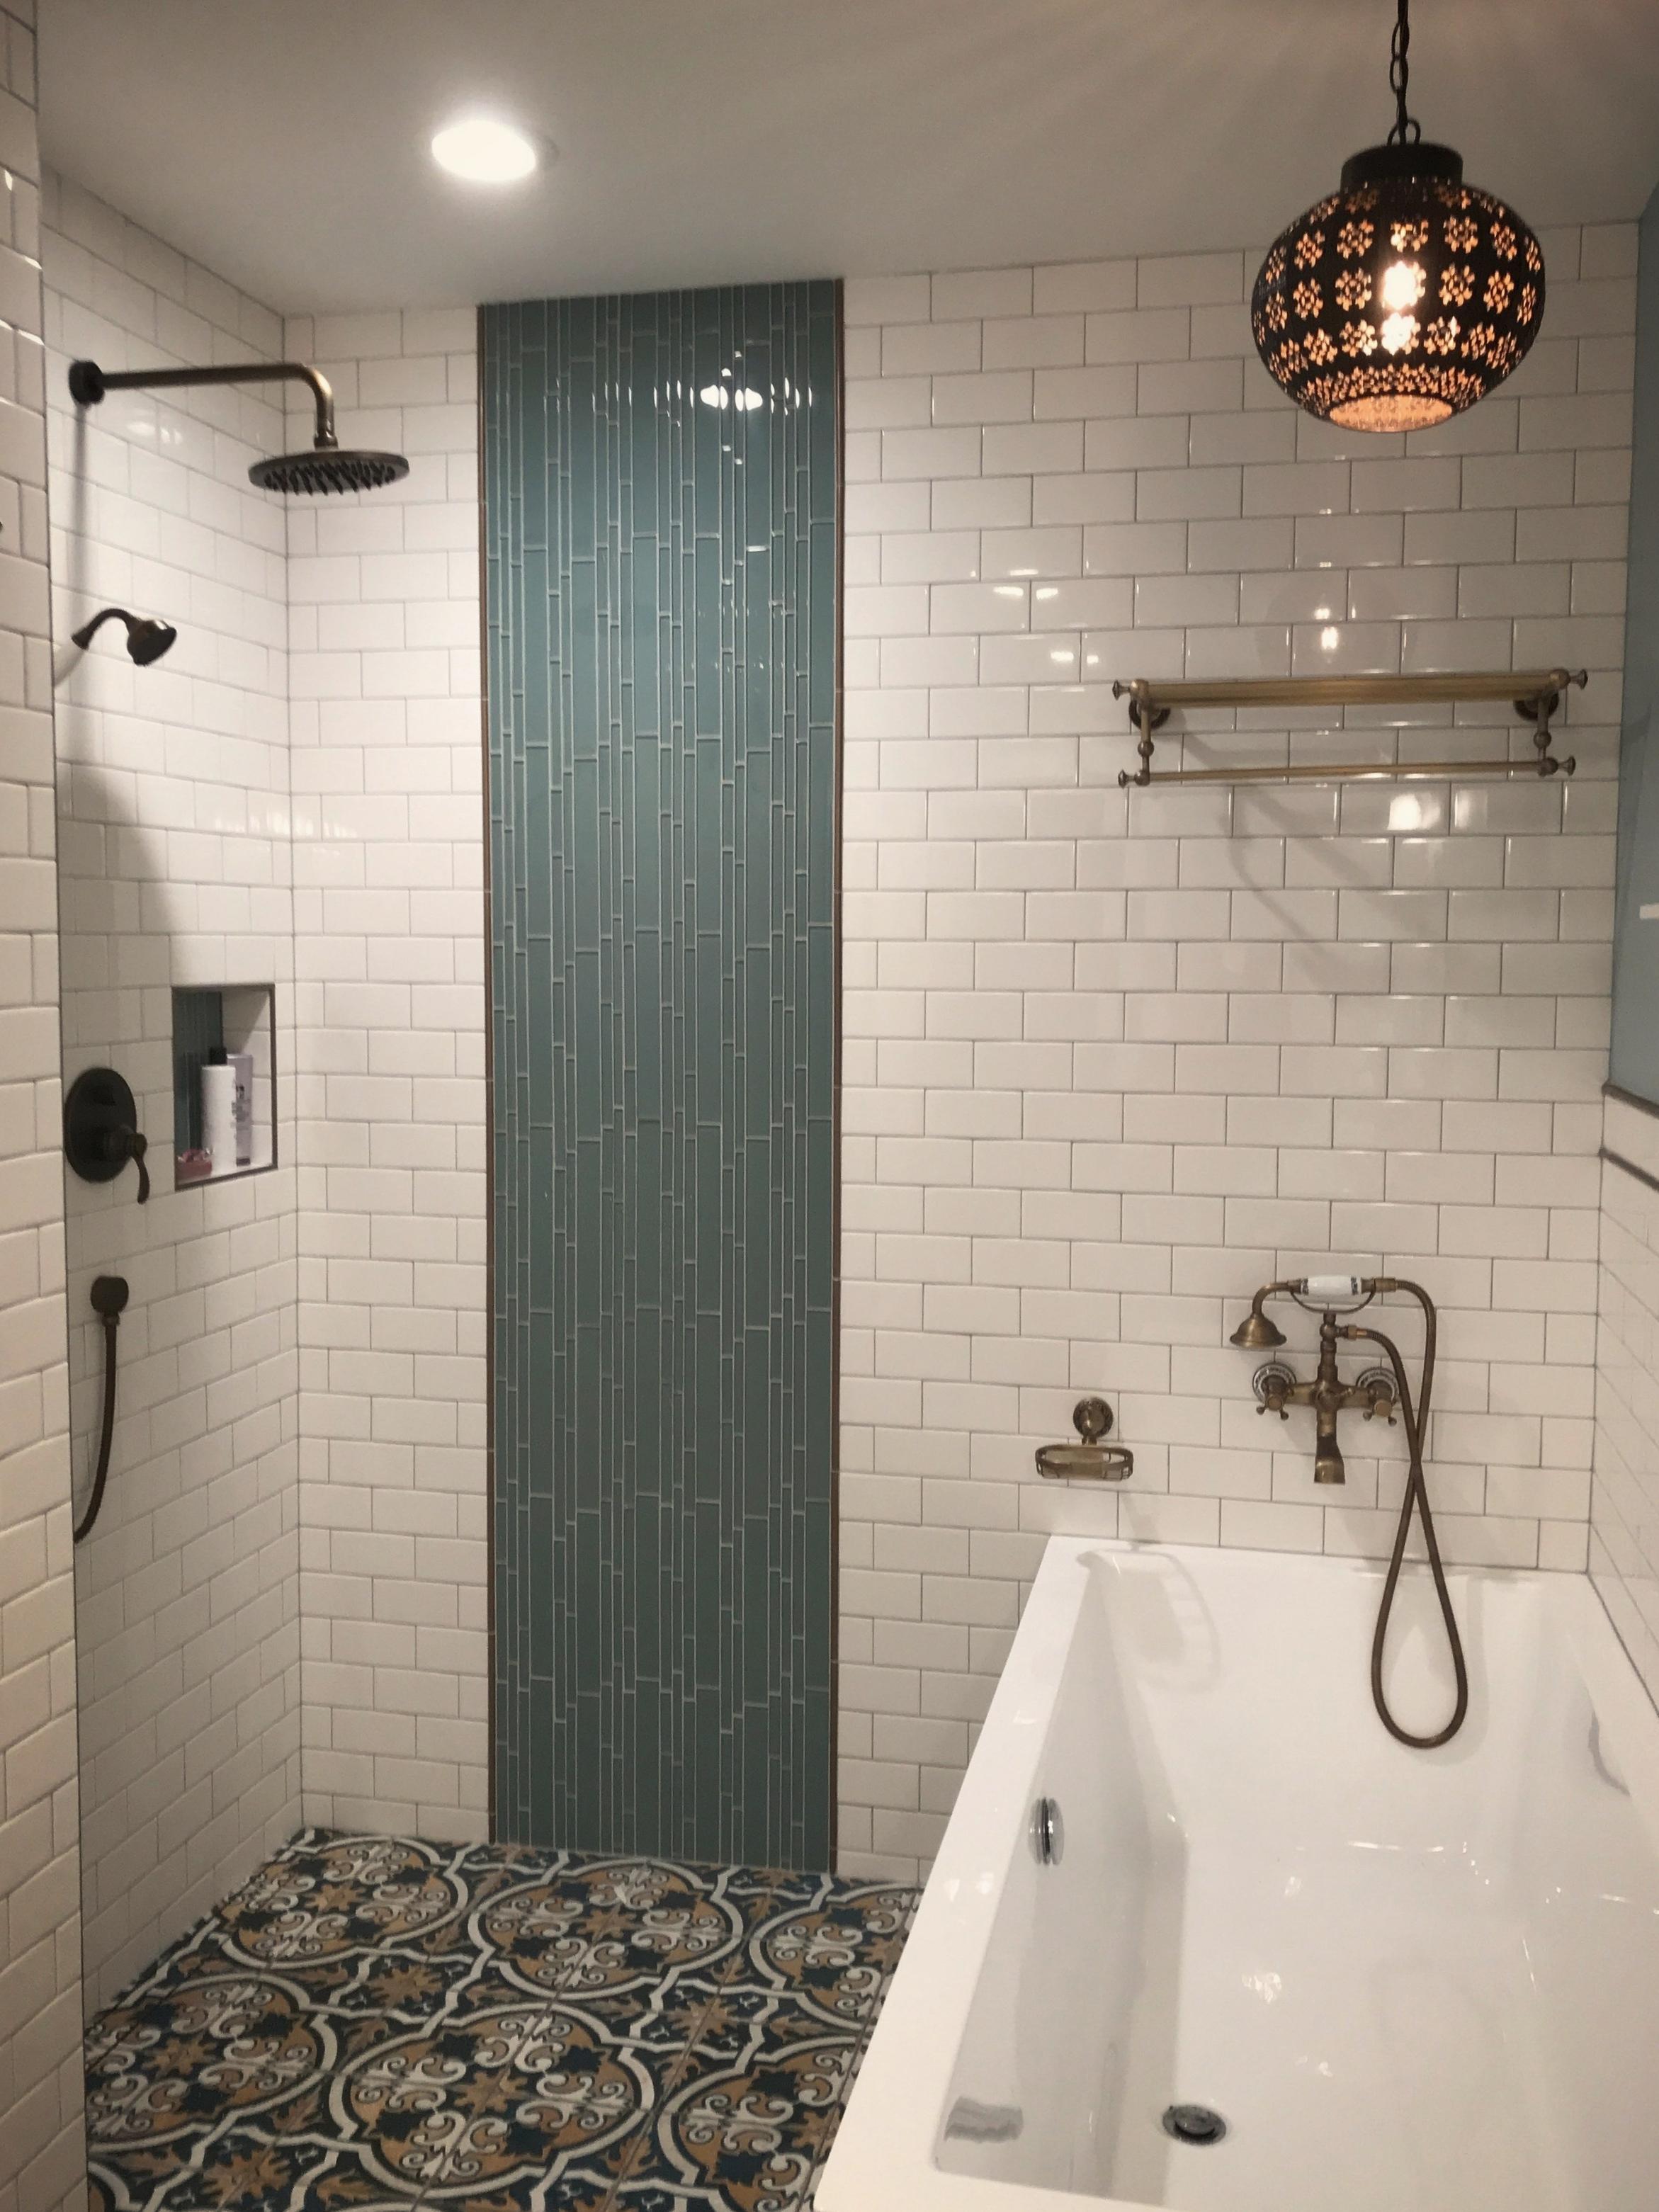 Batista Residence Bath.jpeg